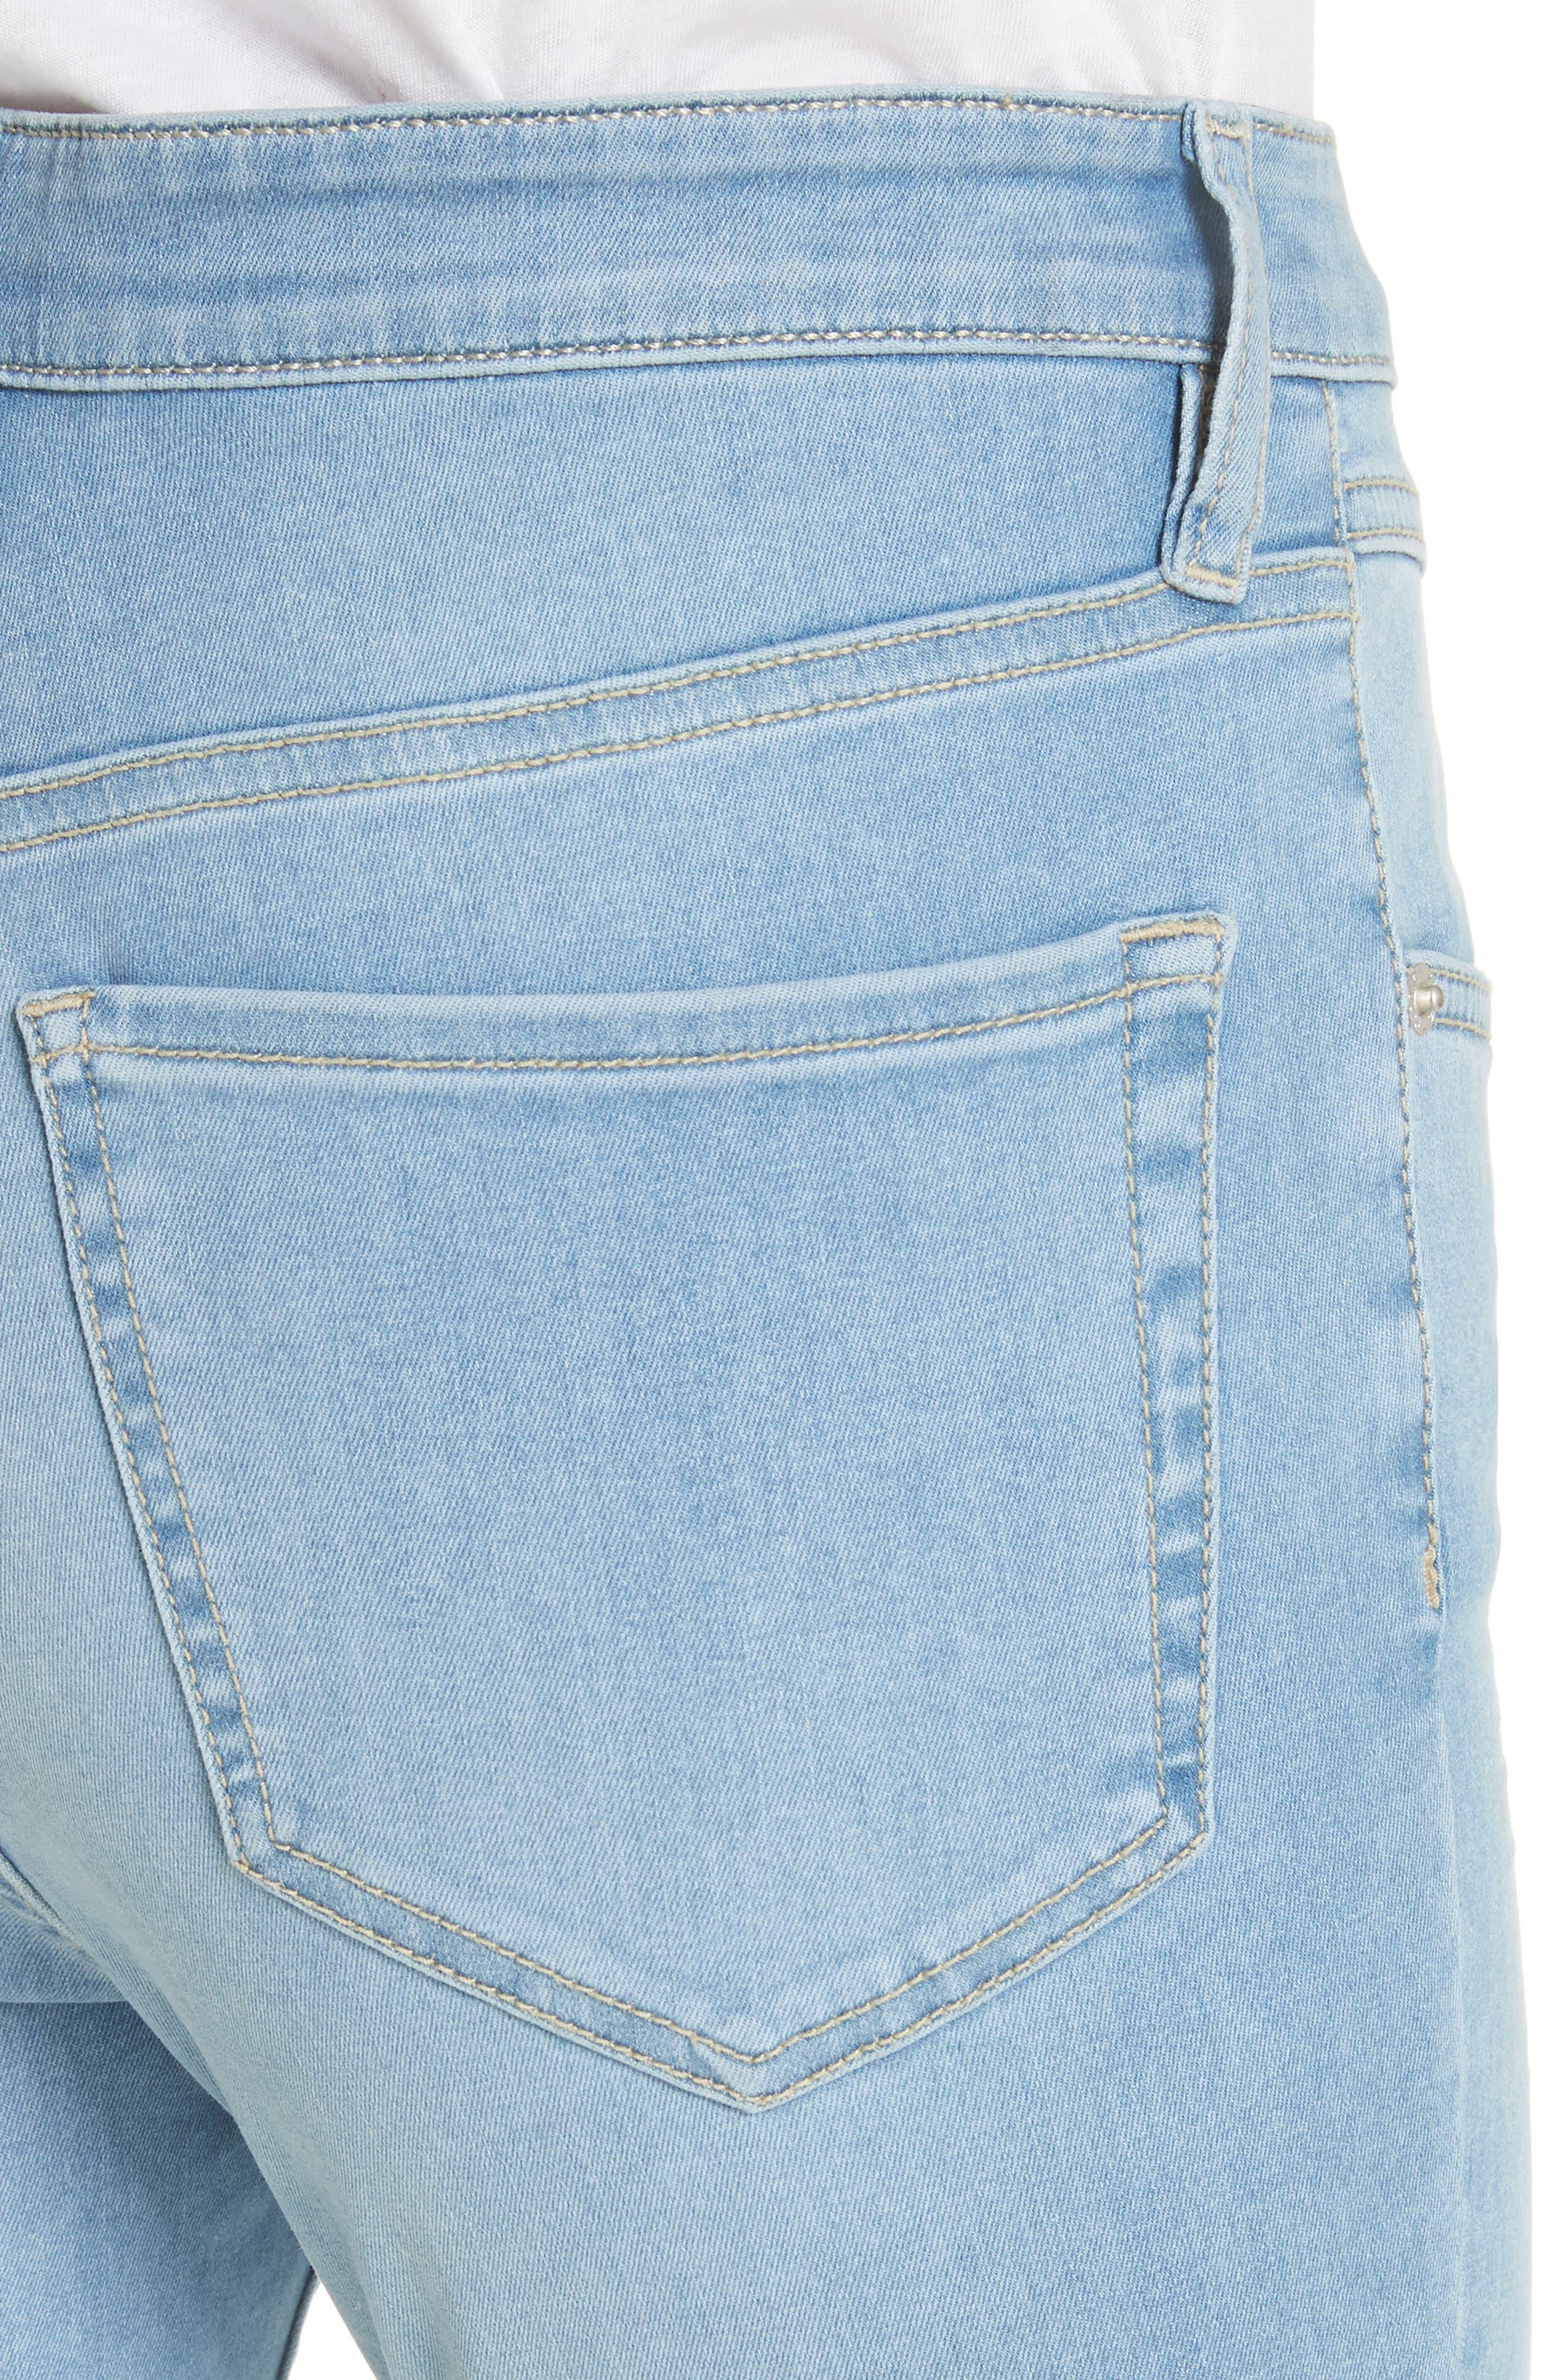 Mara Skinny Jeans,                             Alternate thumbnail 4, color,                             Blue